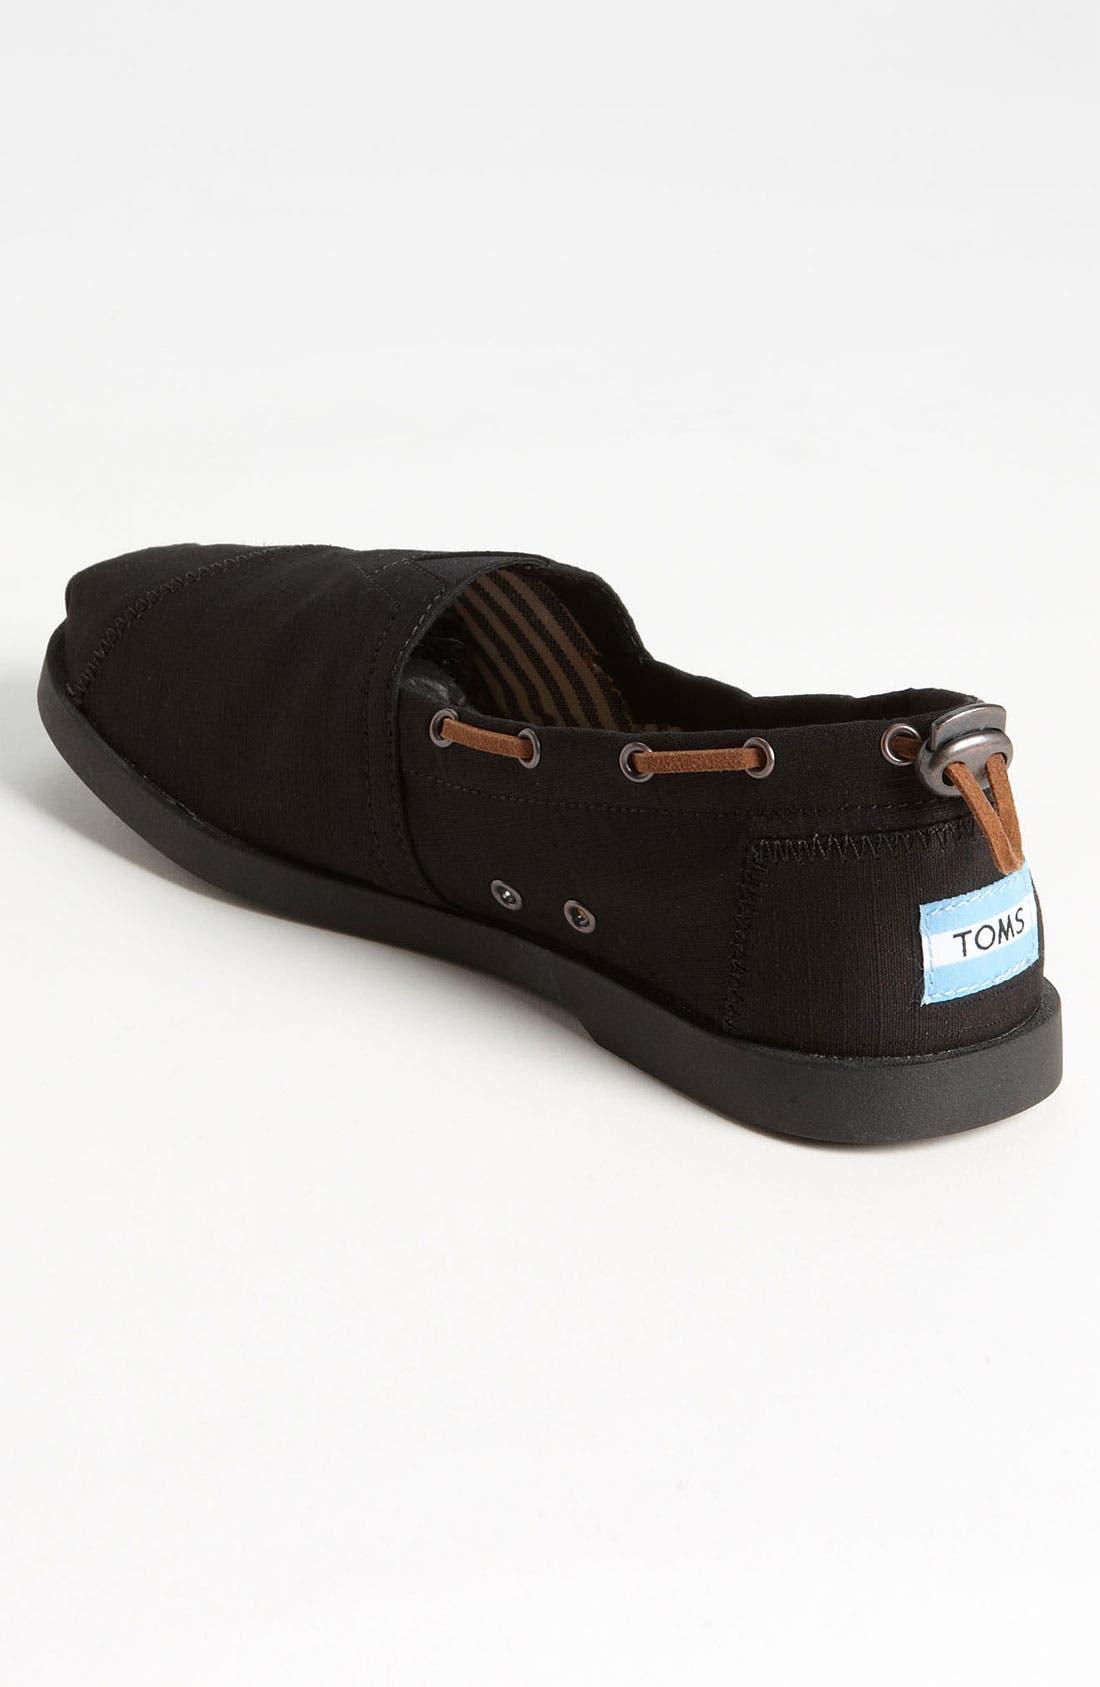 Alternate Image 2  - TOMS 'Bimini - Nautical' Boat Shoe (Men)